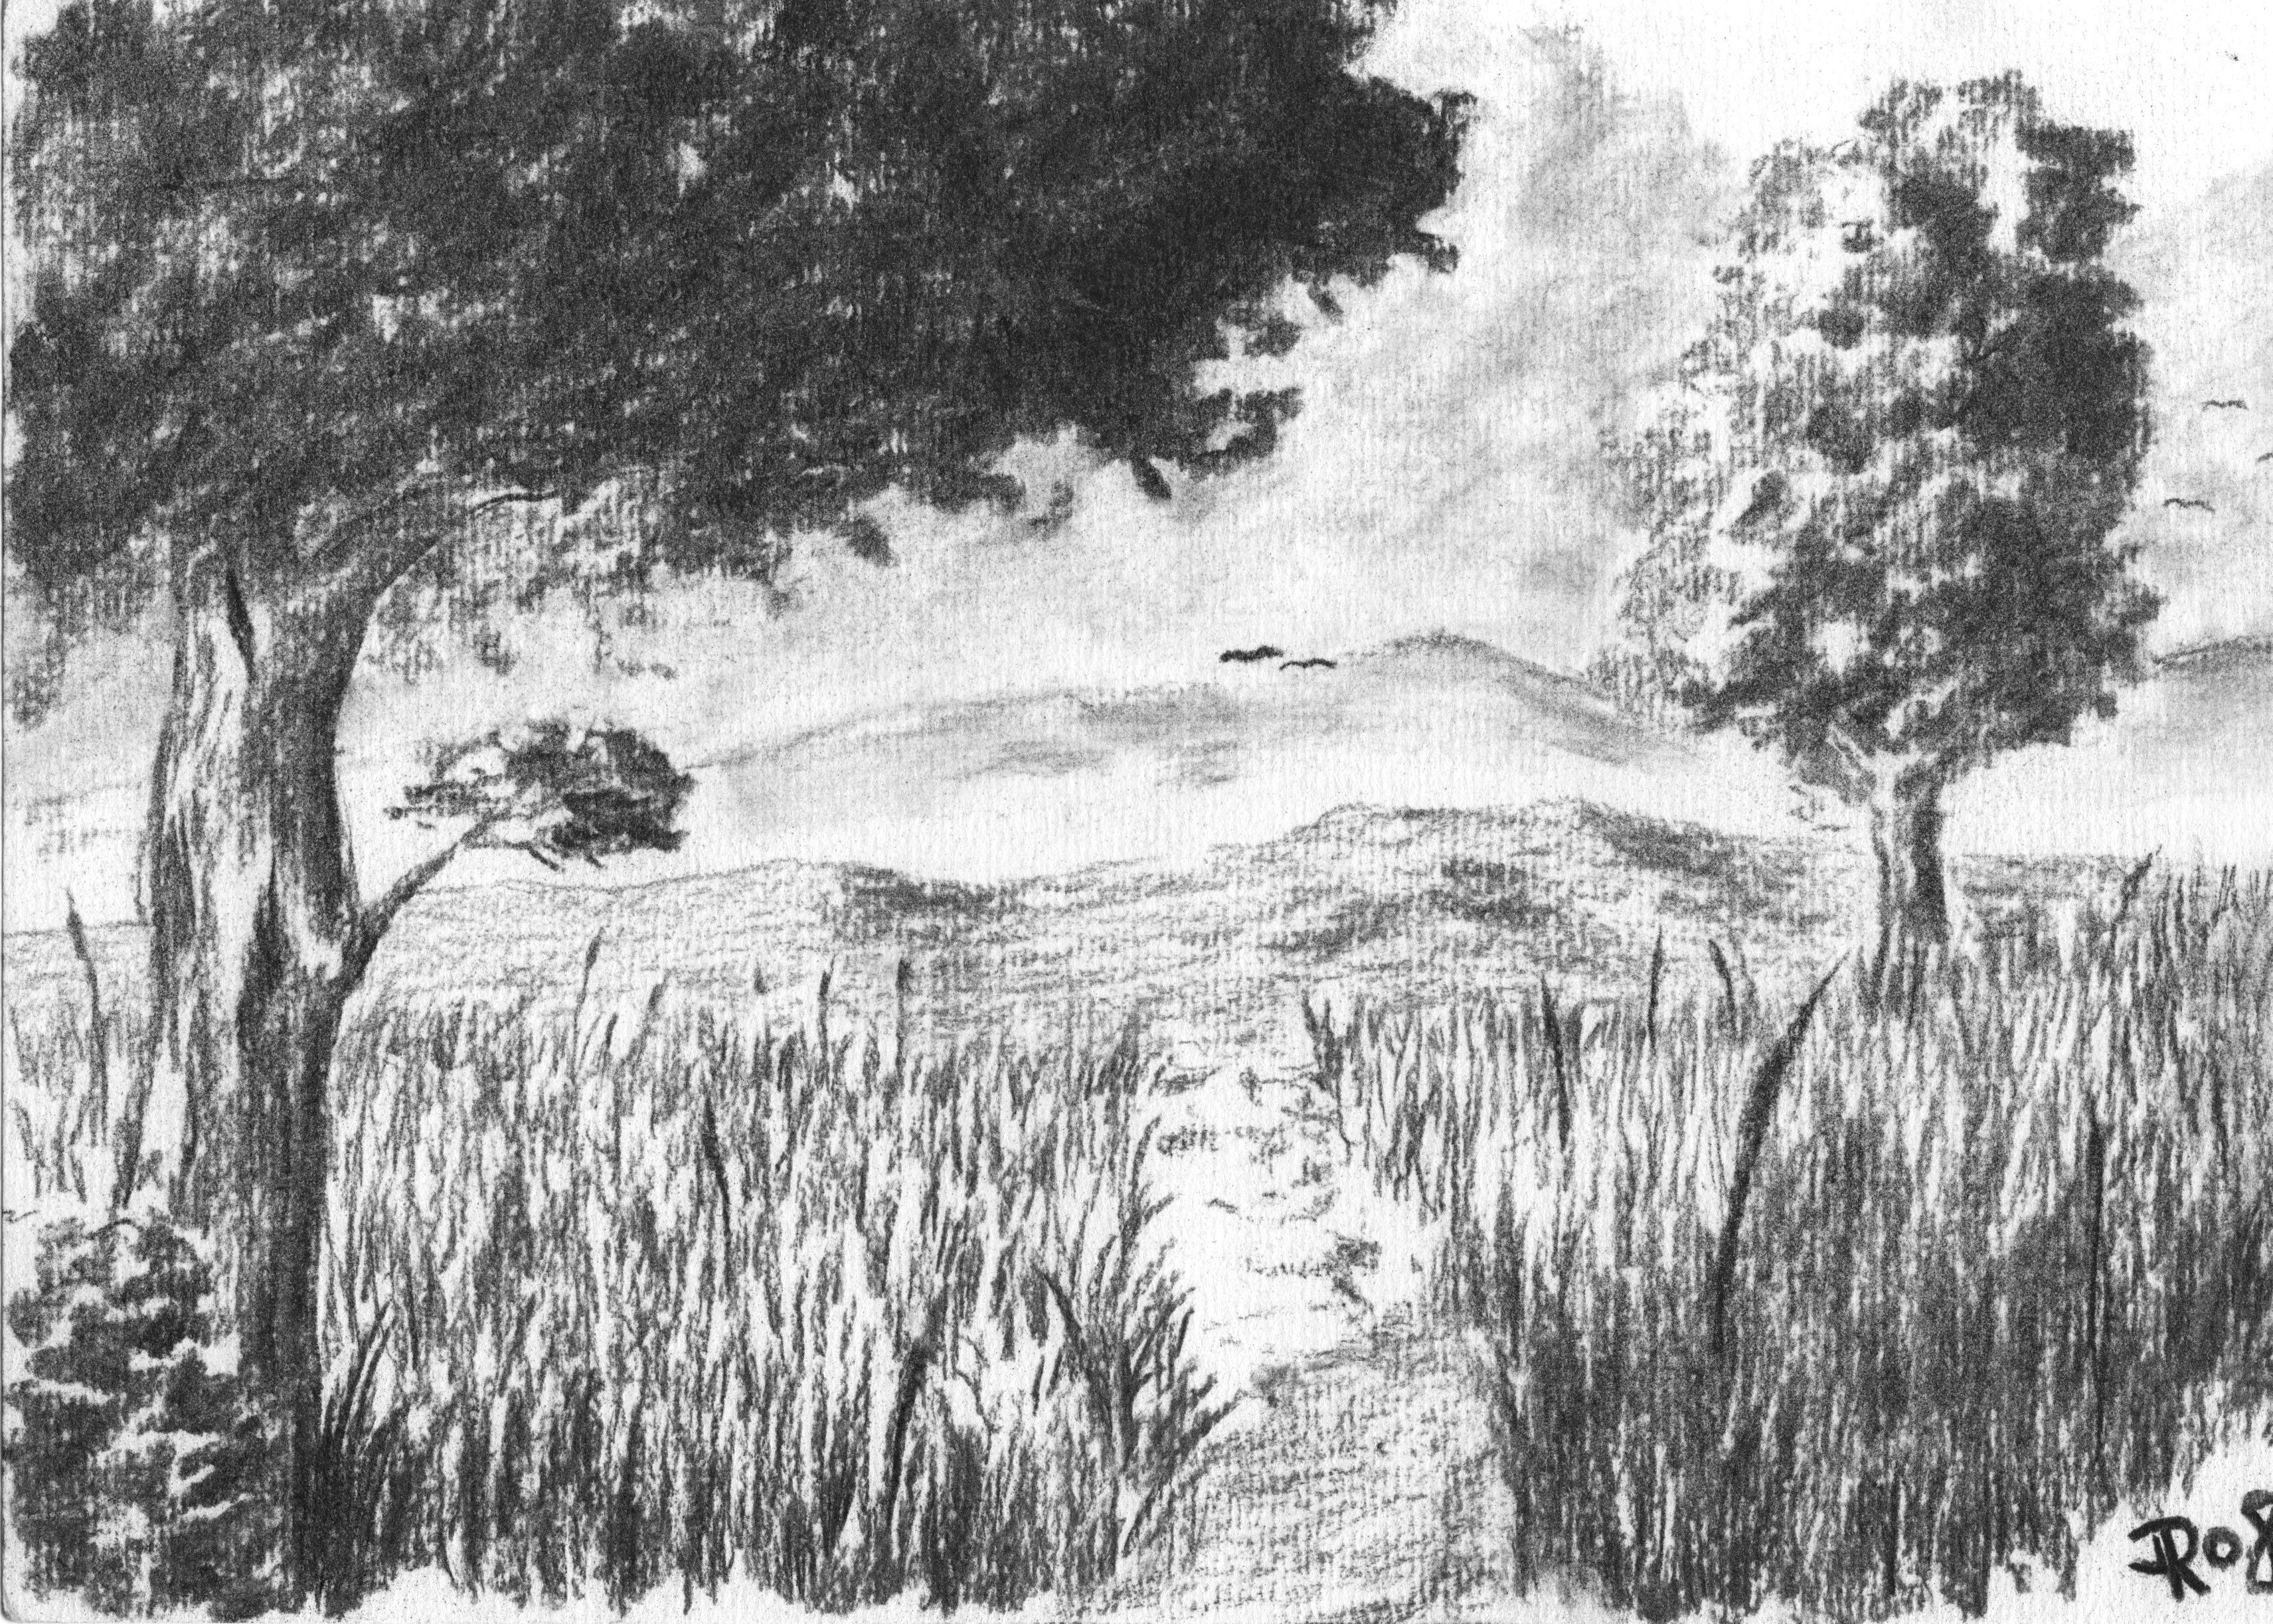 landscape charcoal sketches - photo #1